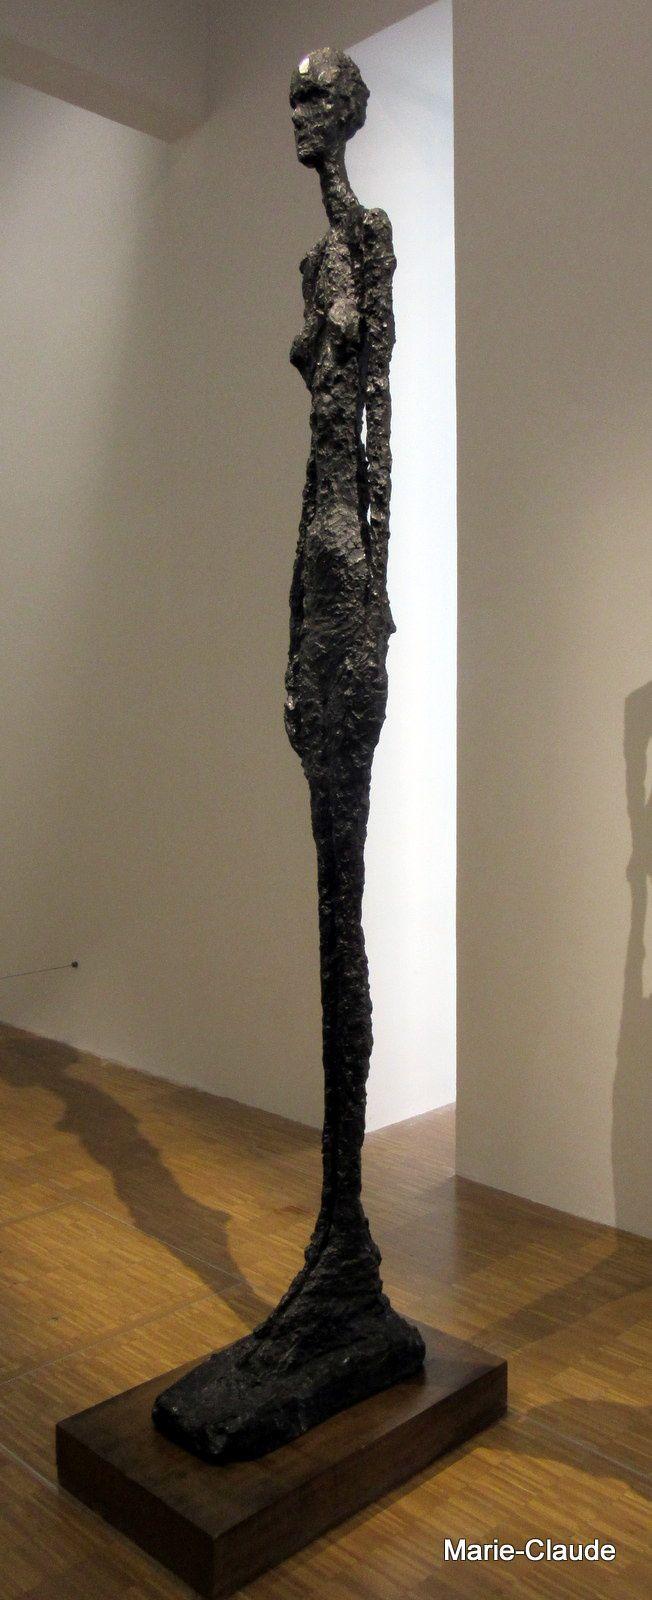 La femme debout de Giacometti